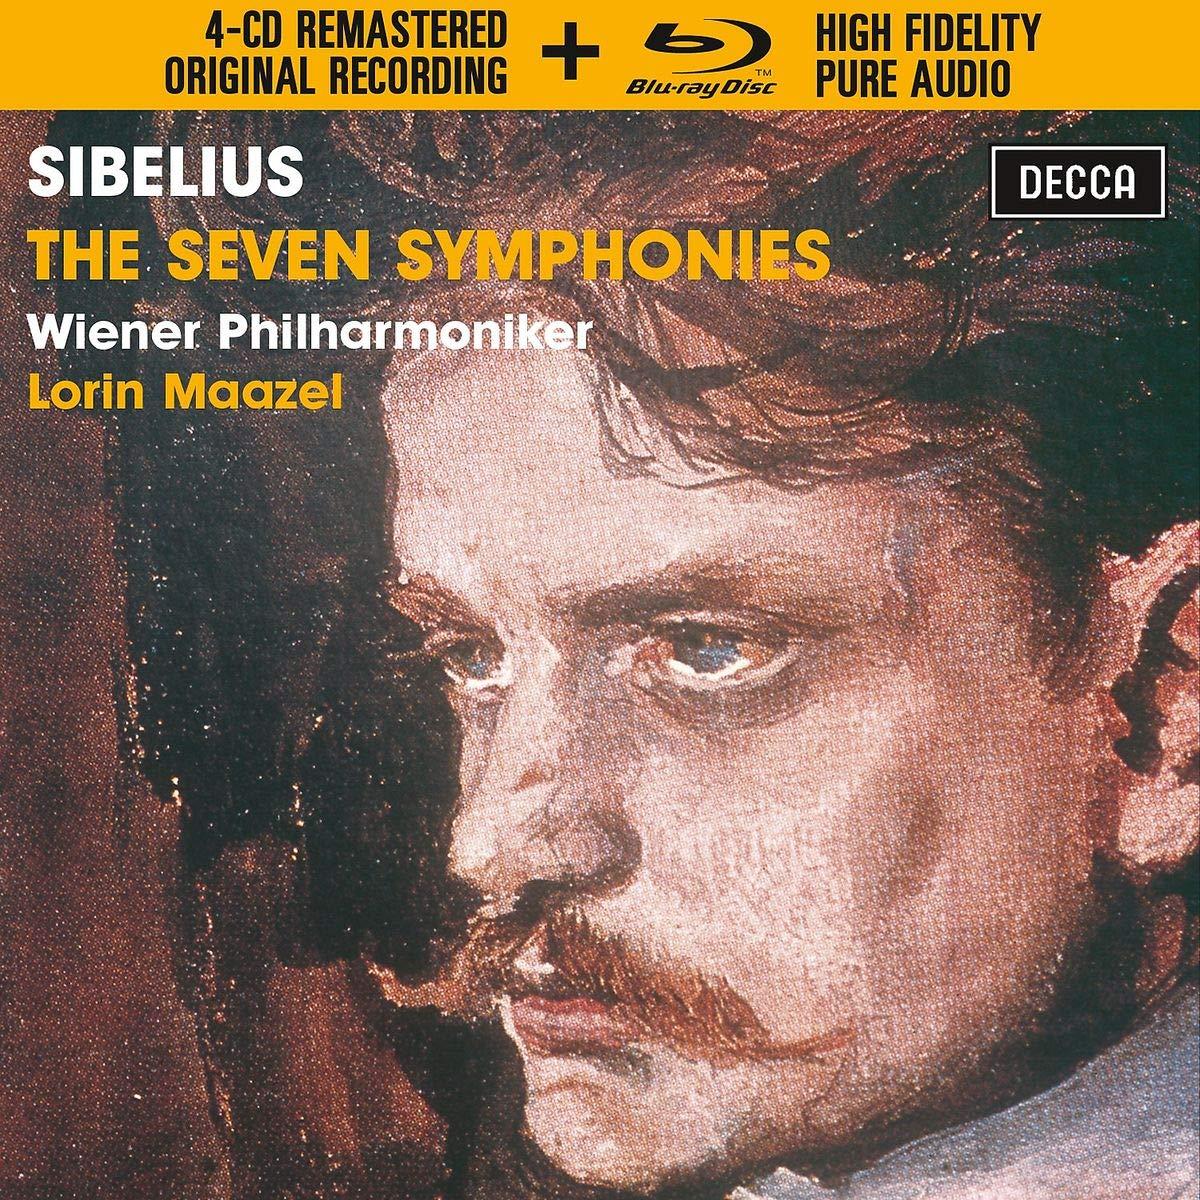 Sibelius: The Symphonies [4 CD/Blu-ray Combo]